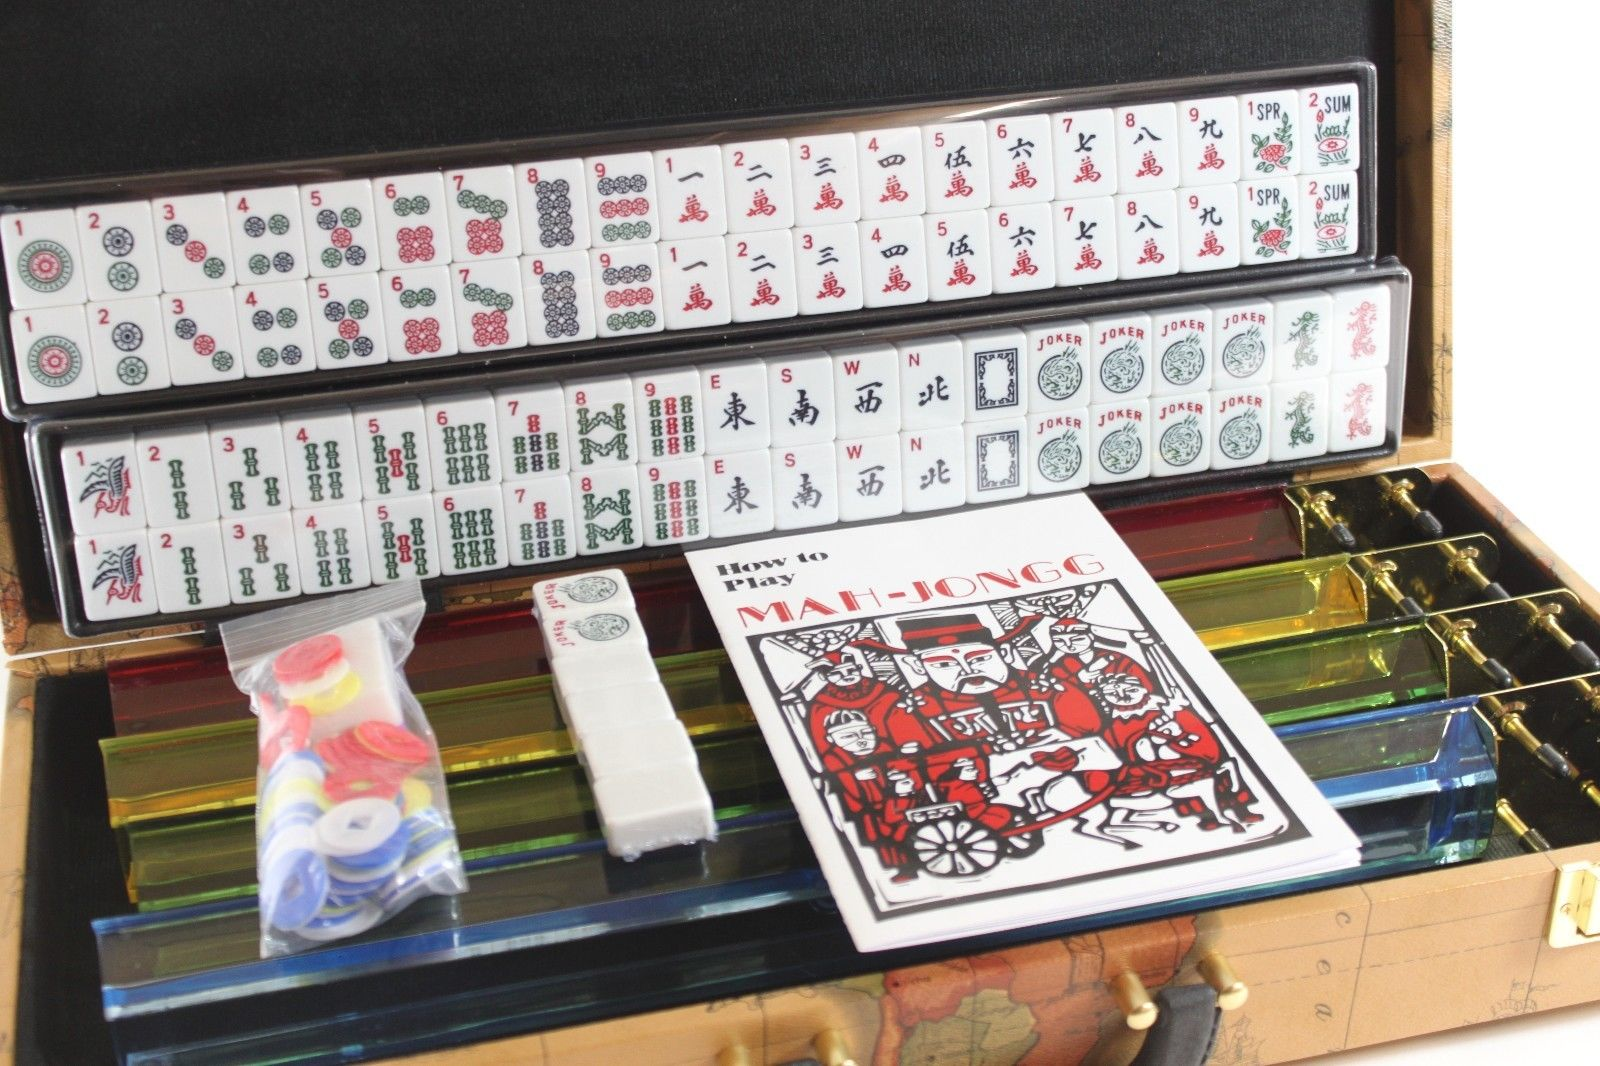 Mah-jongg with joker tiles castle game of 4 walls mahjong ...